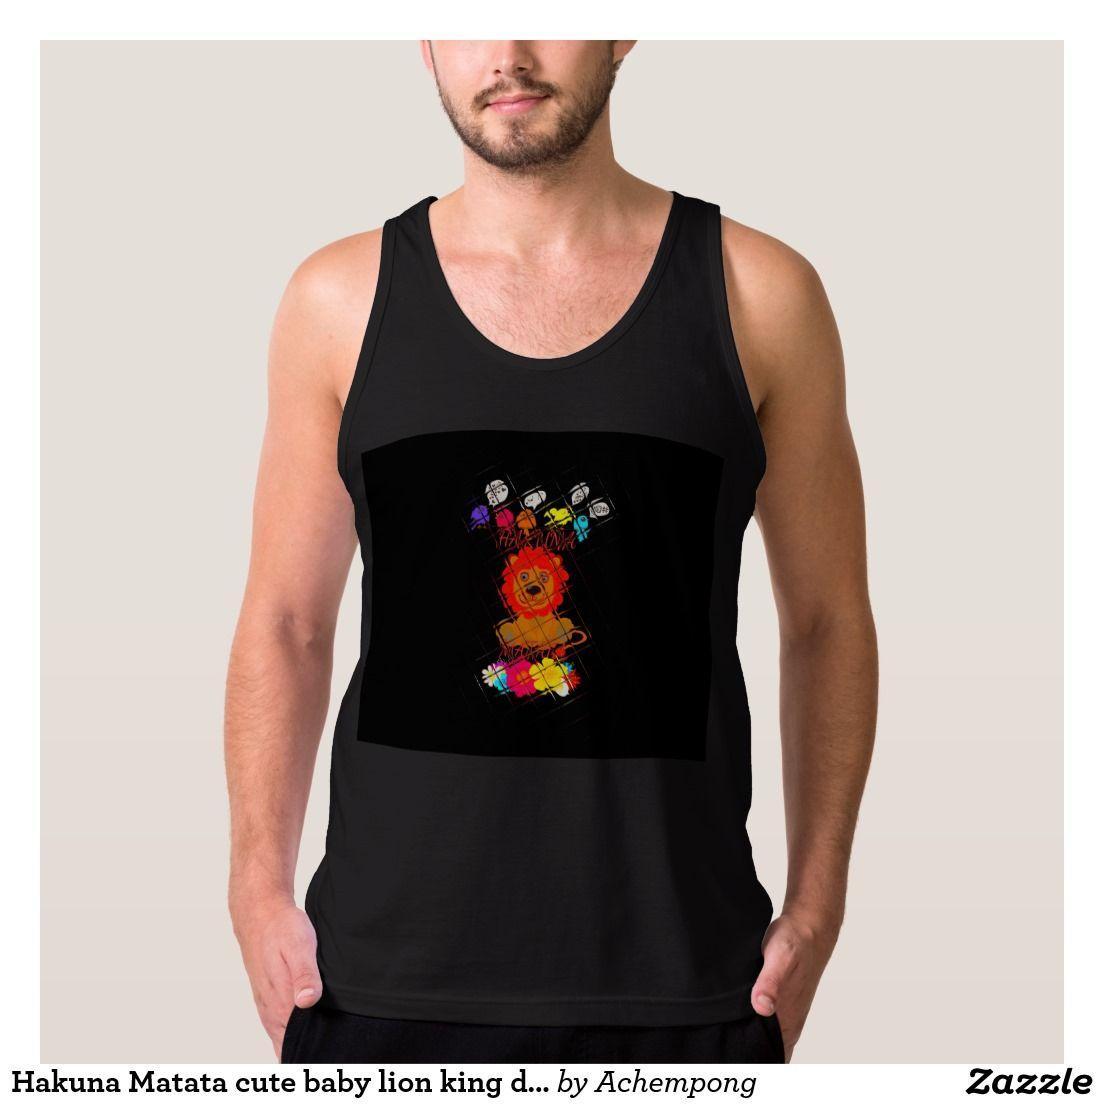 Design t shirt zazzle - Hakuna Matata Cute Baby Lion King Design T Shirt